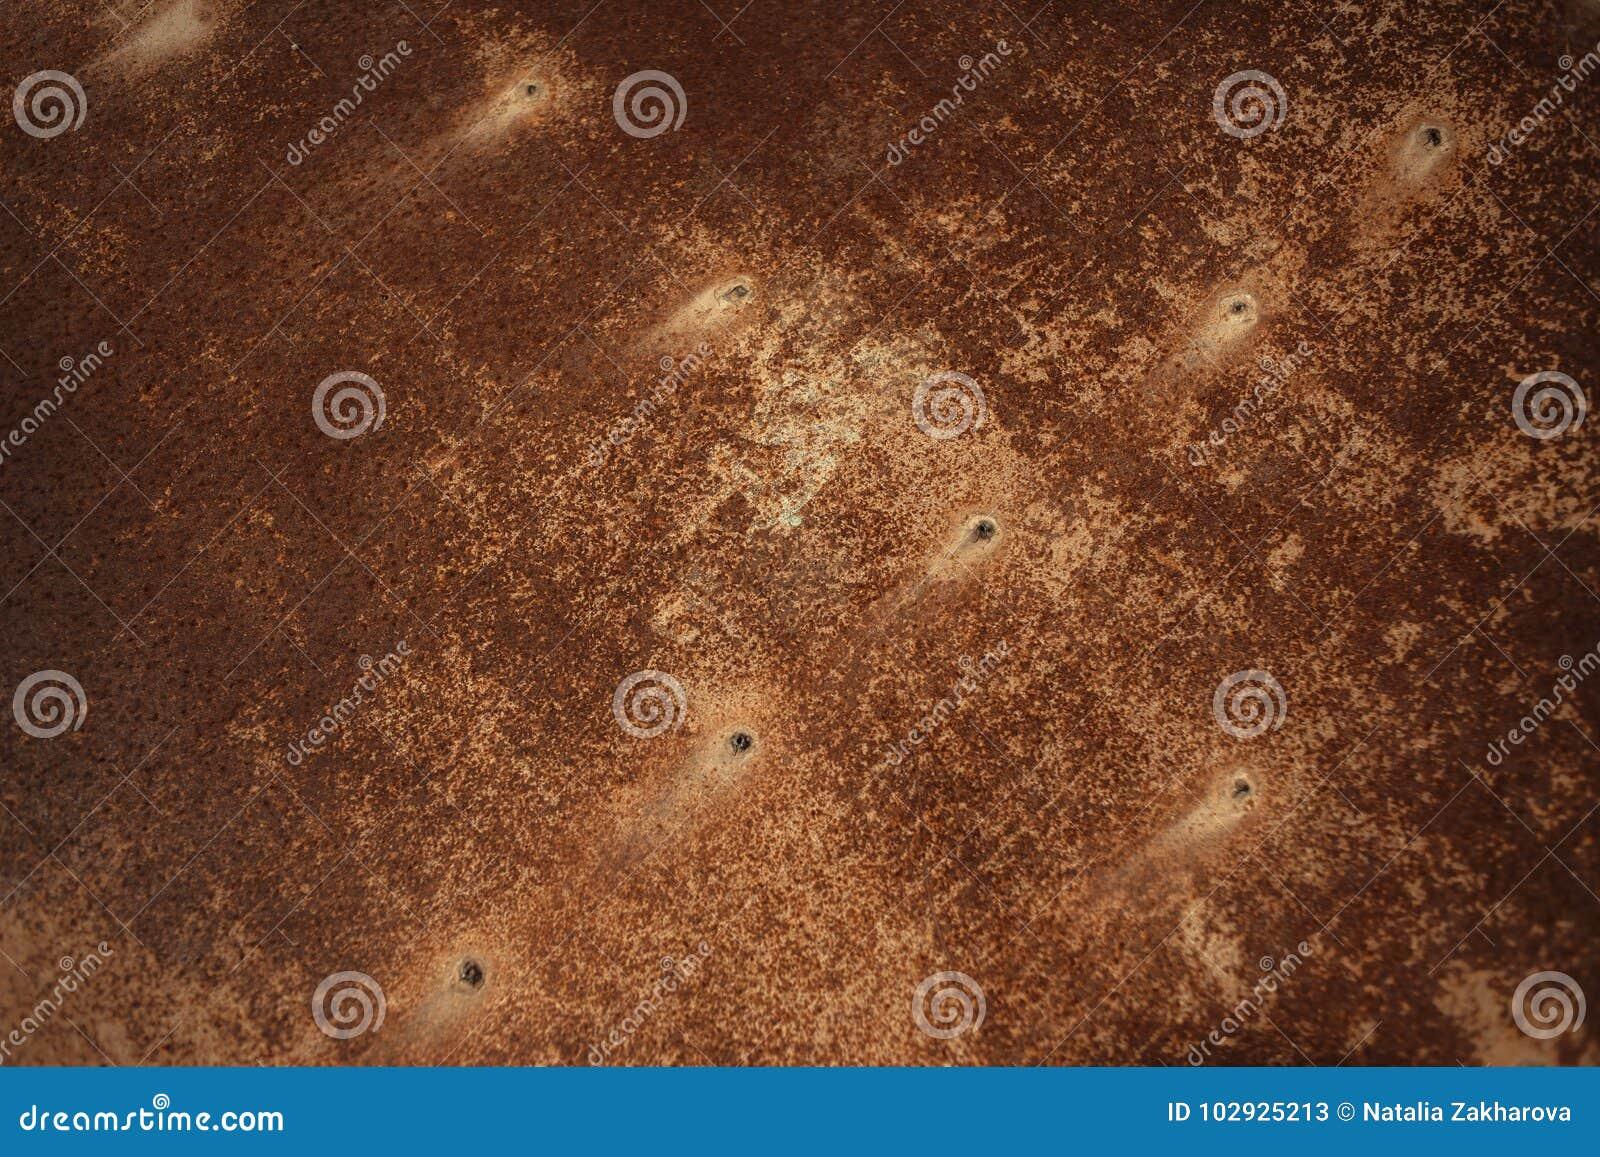 Brown Rust Textured Background. Decay steel metal Background. Gr